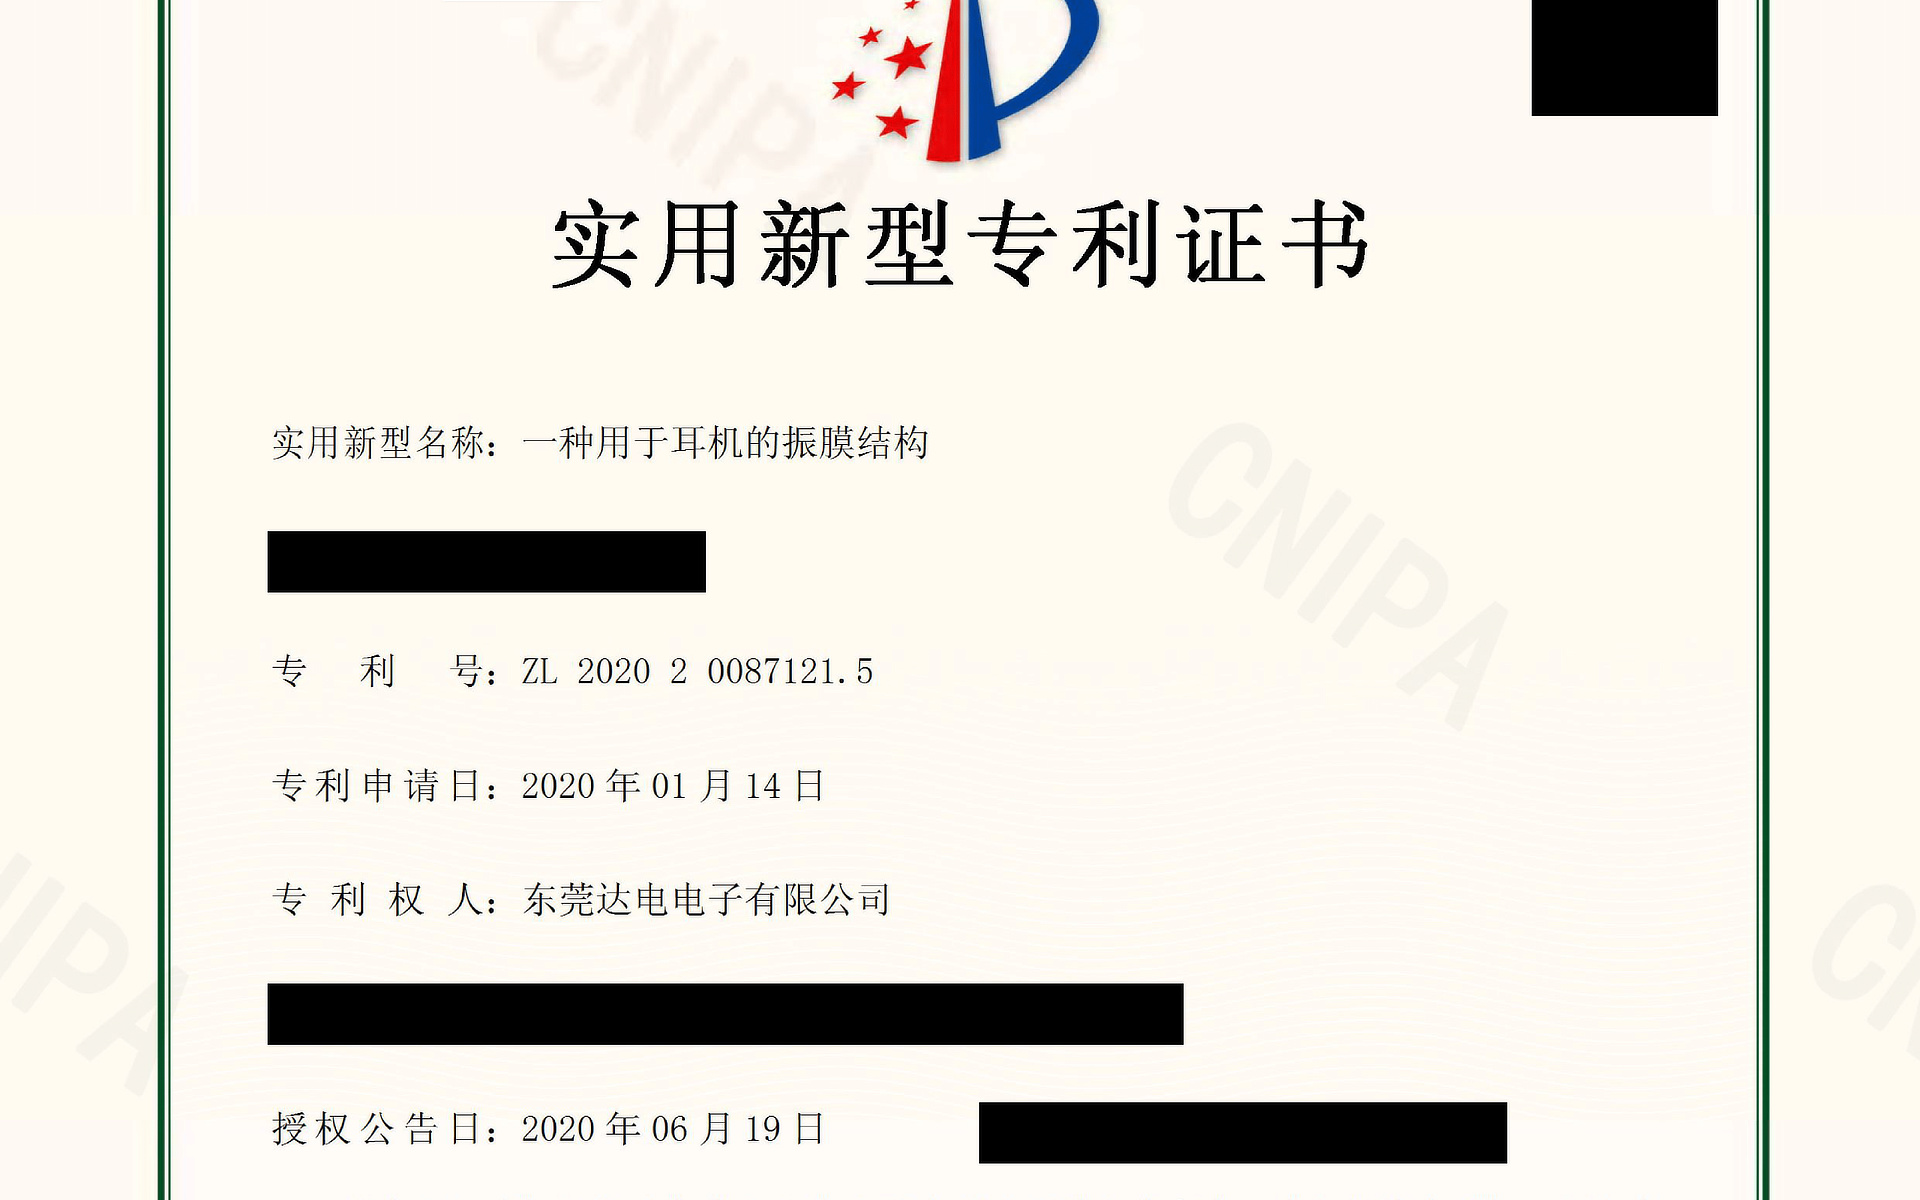 LUNA_Patent_Redacted_Cropped.jpg